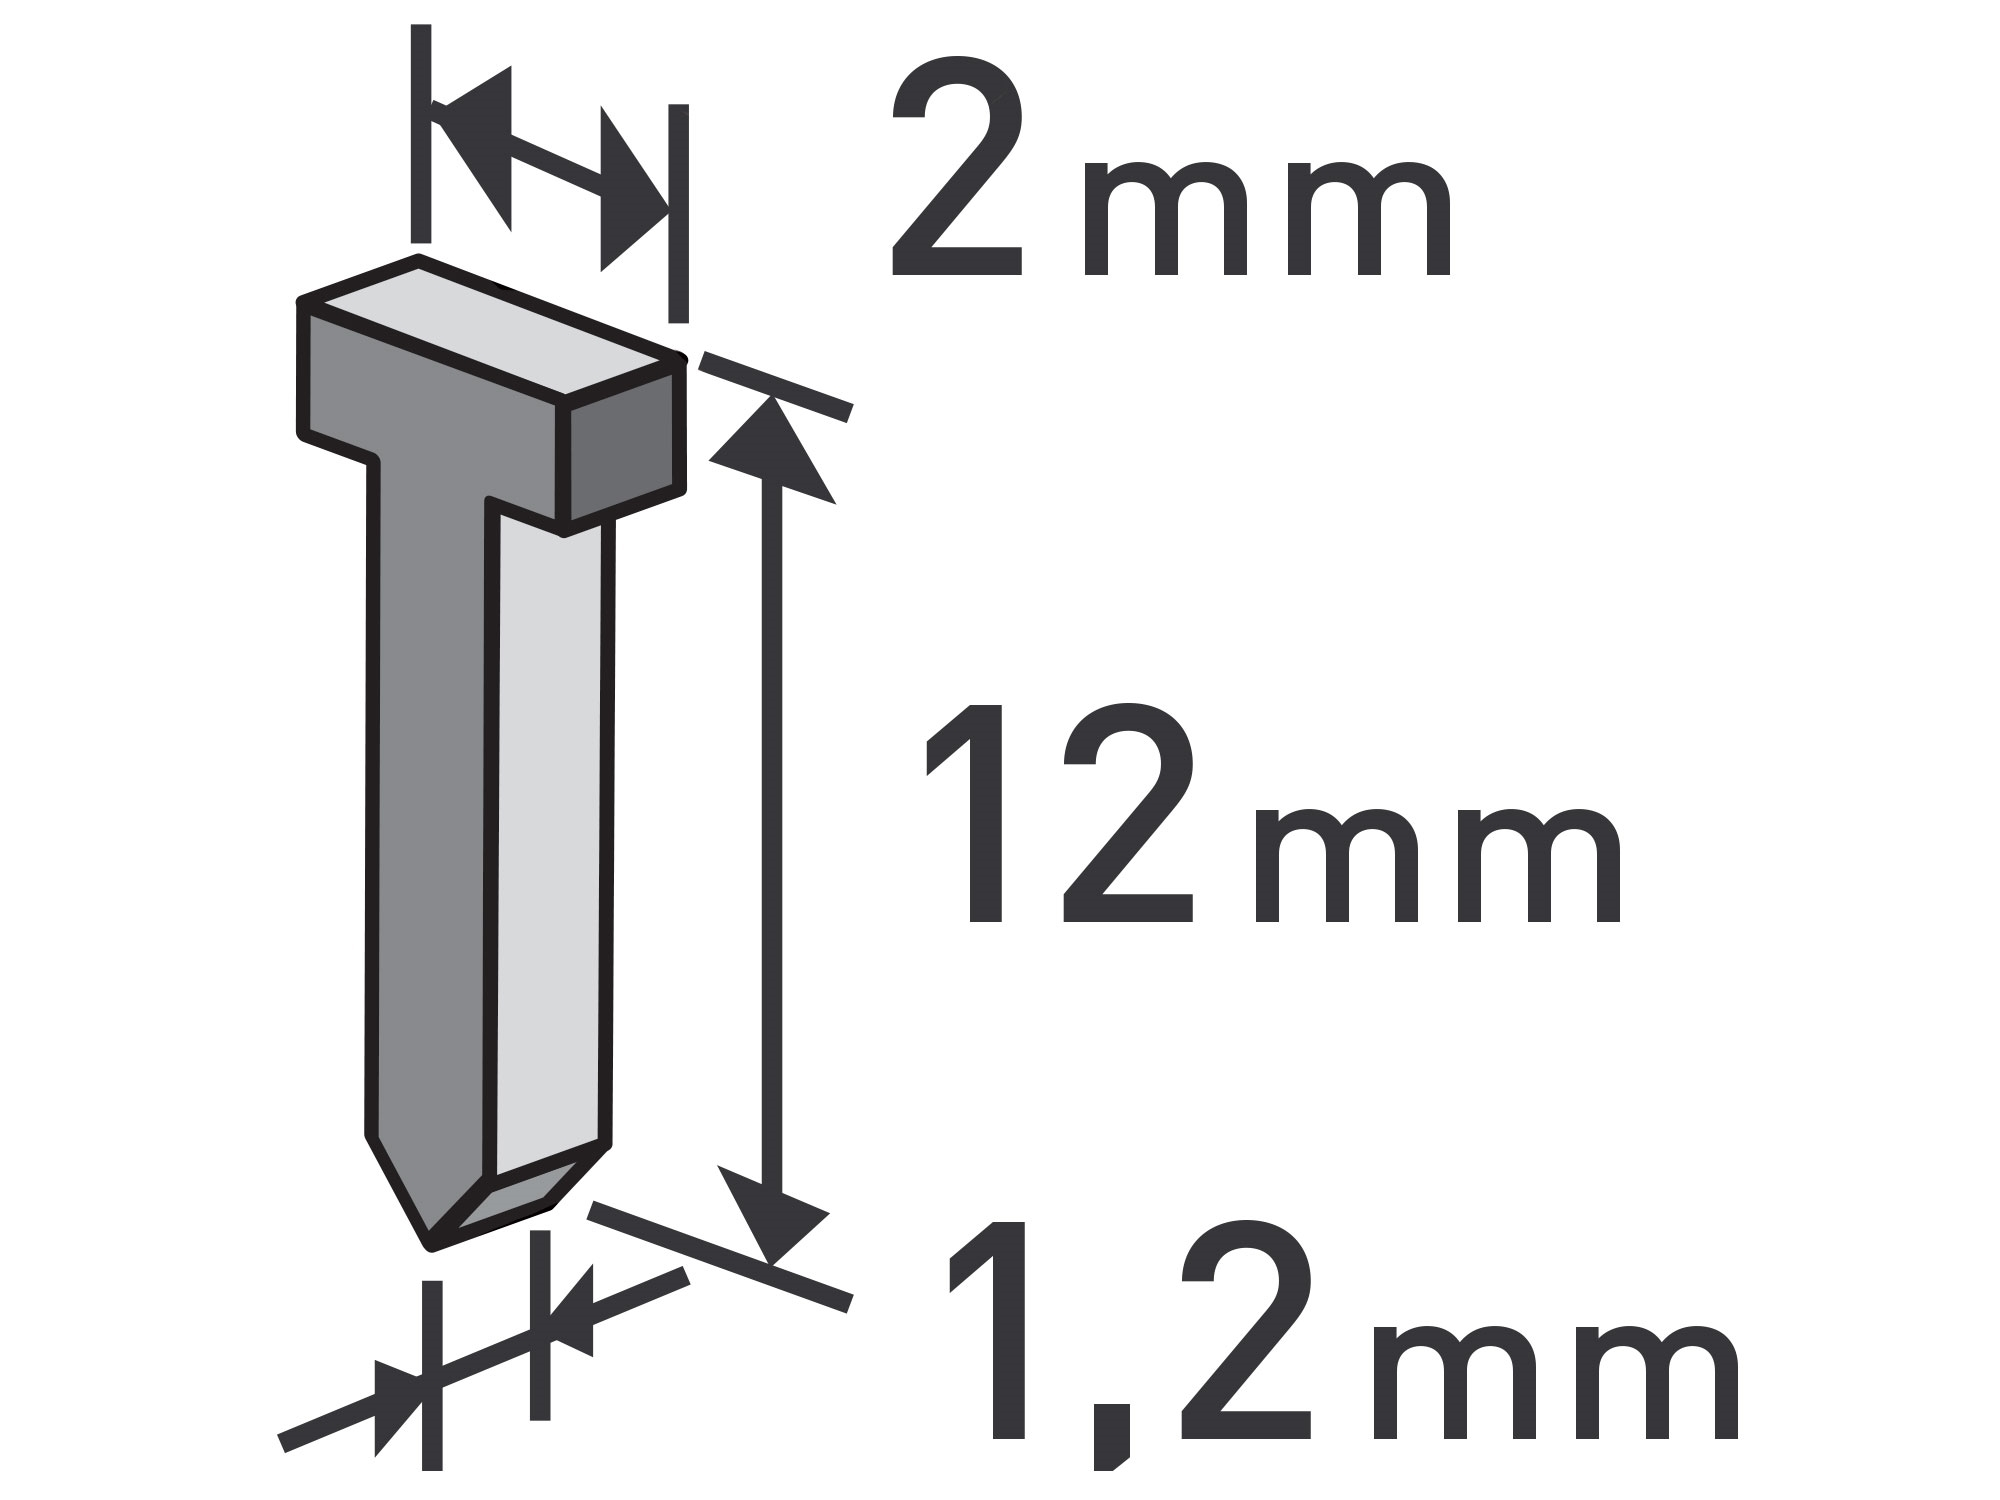 hřebíky, balení 1000ks, 12mm, 2,0x0,52x1,2mm, EXTOL PREMIUM 8852404